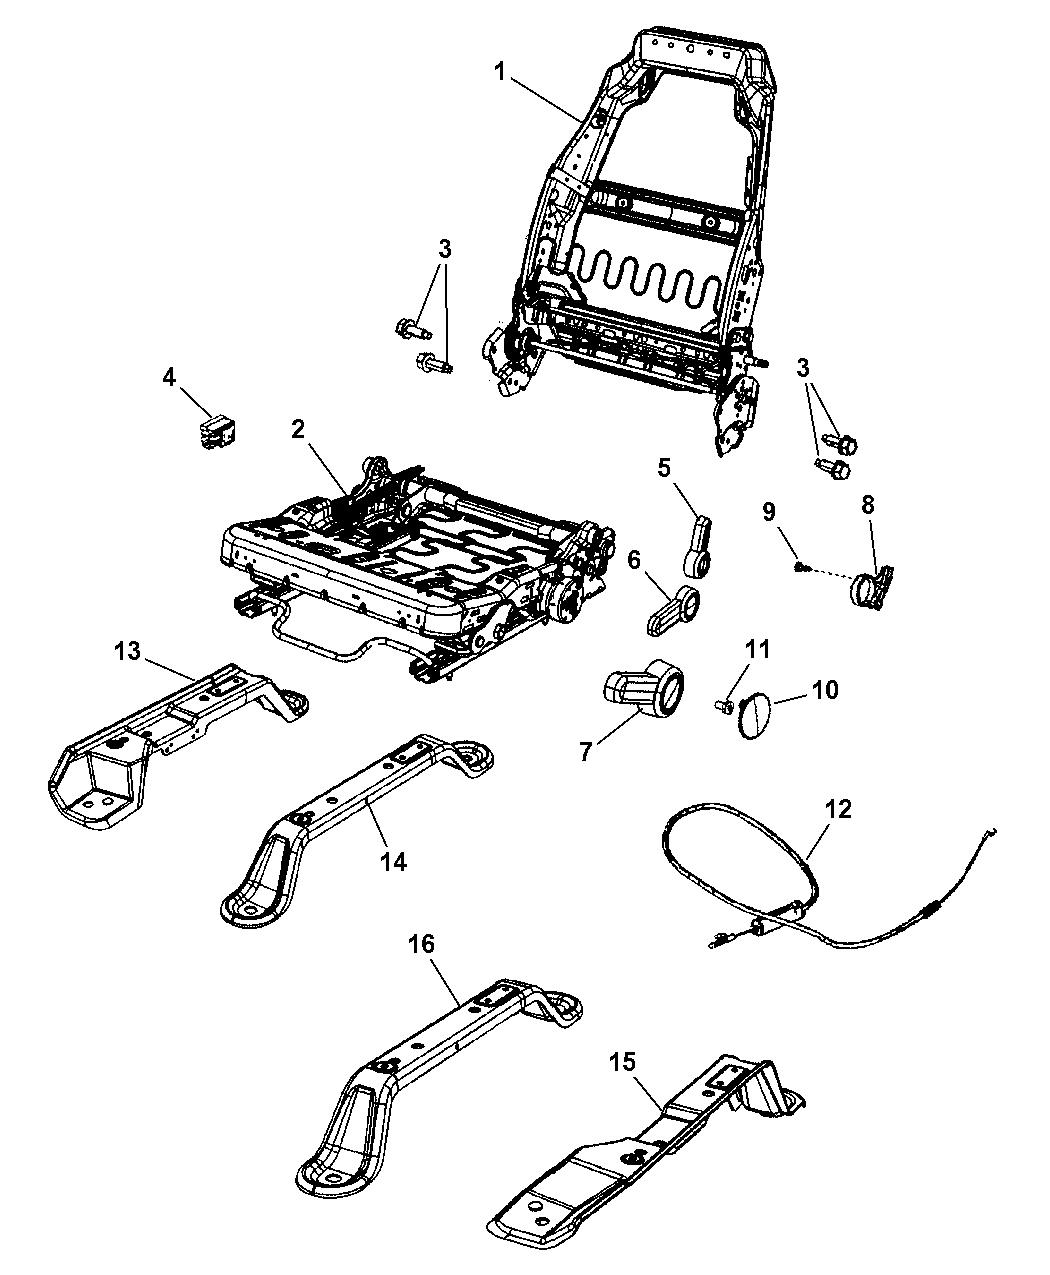 2007 Jeep Wrangler Seat Assemblies  Adjusters  Recliners